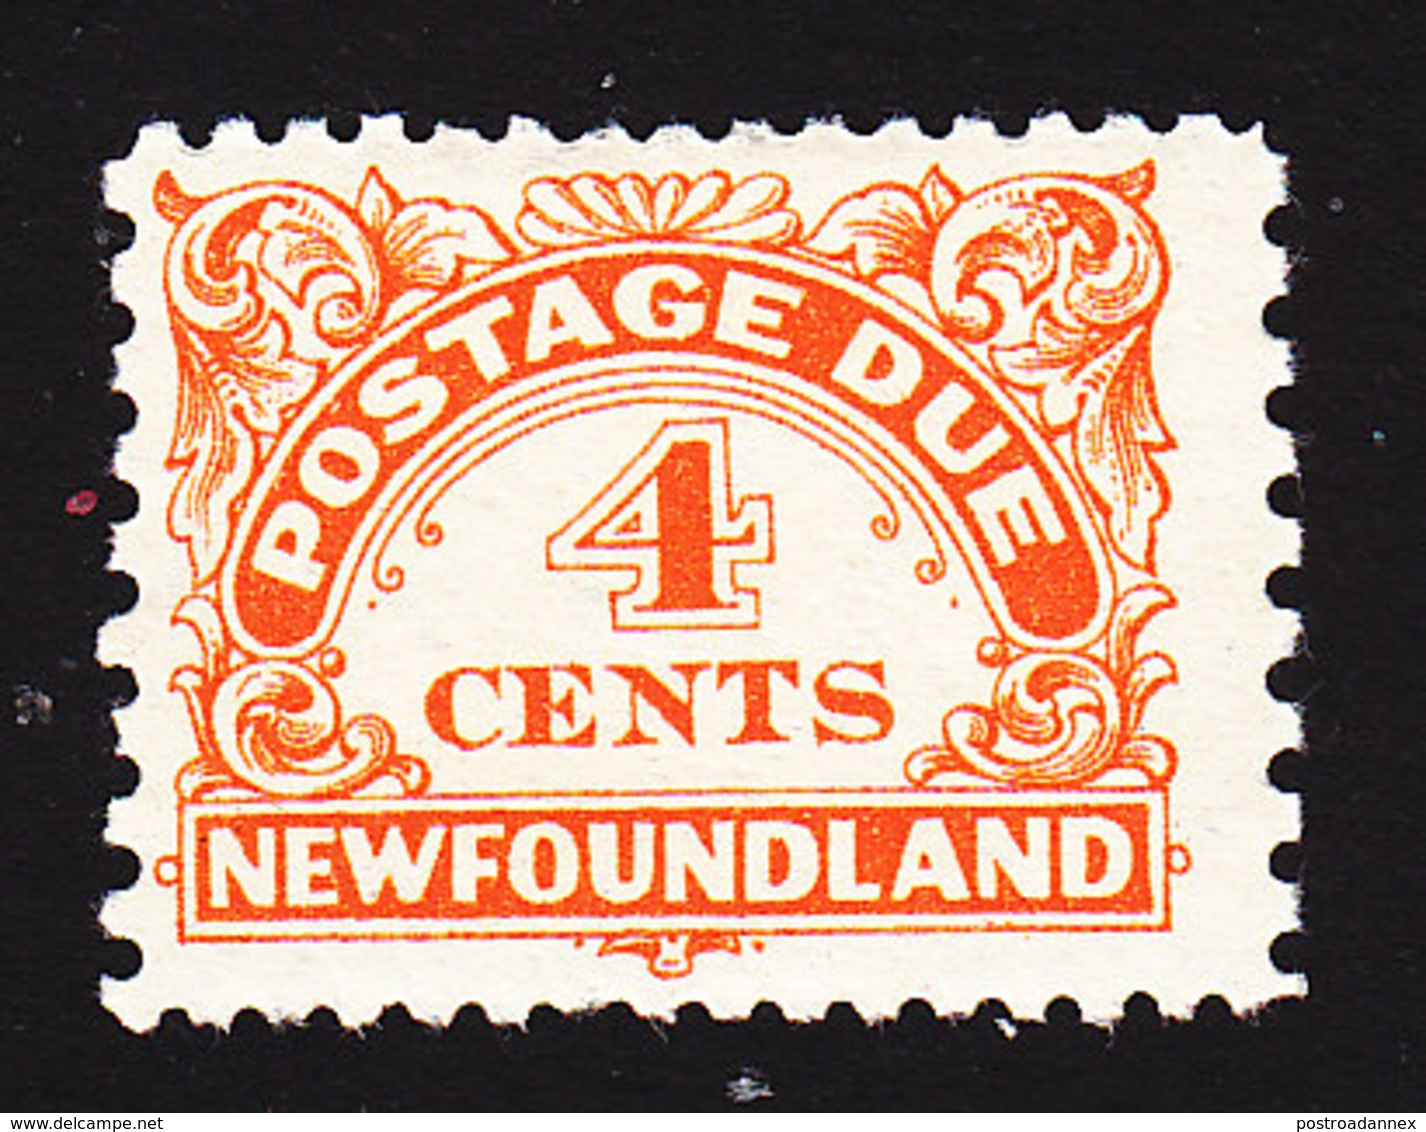 Newfoundland, Scott #J4, Mint Hinged, Postage Due, Issued 1939 - Newfoundland